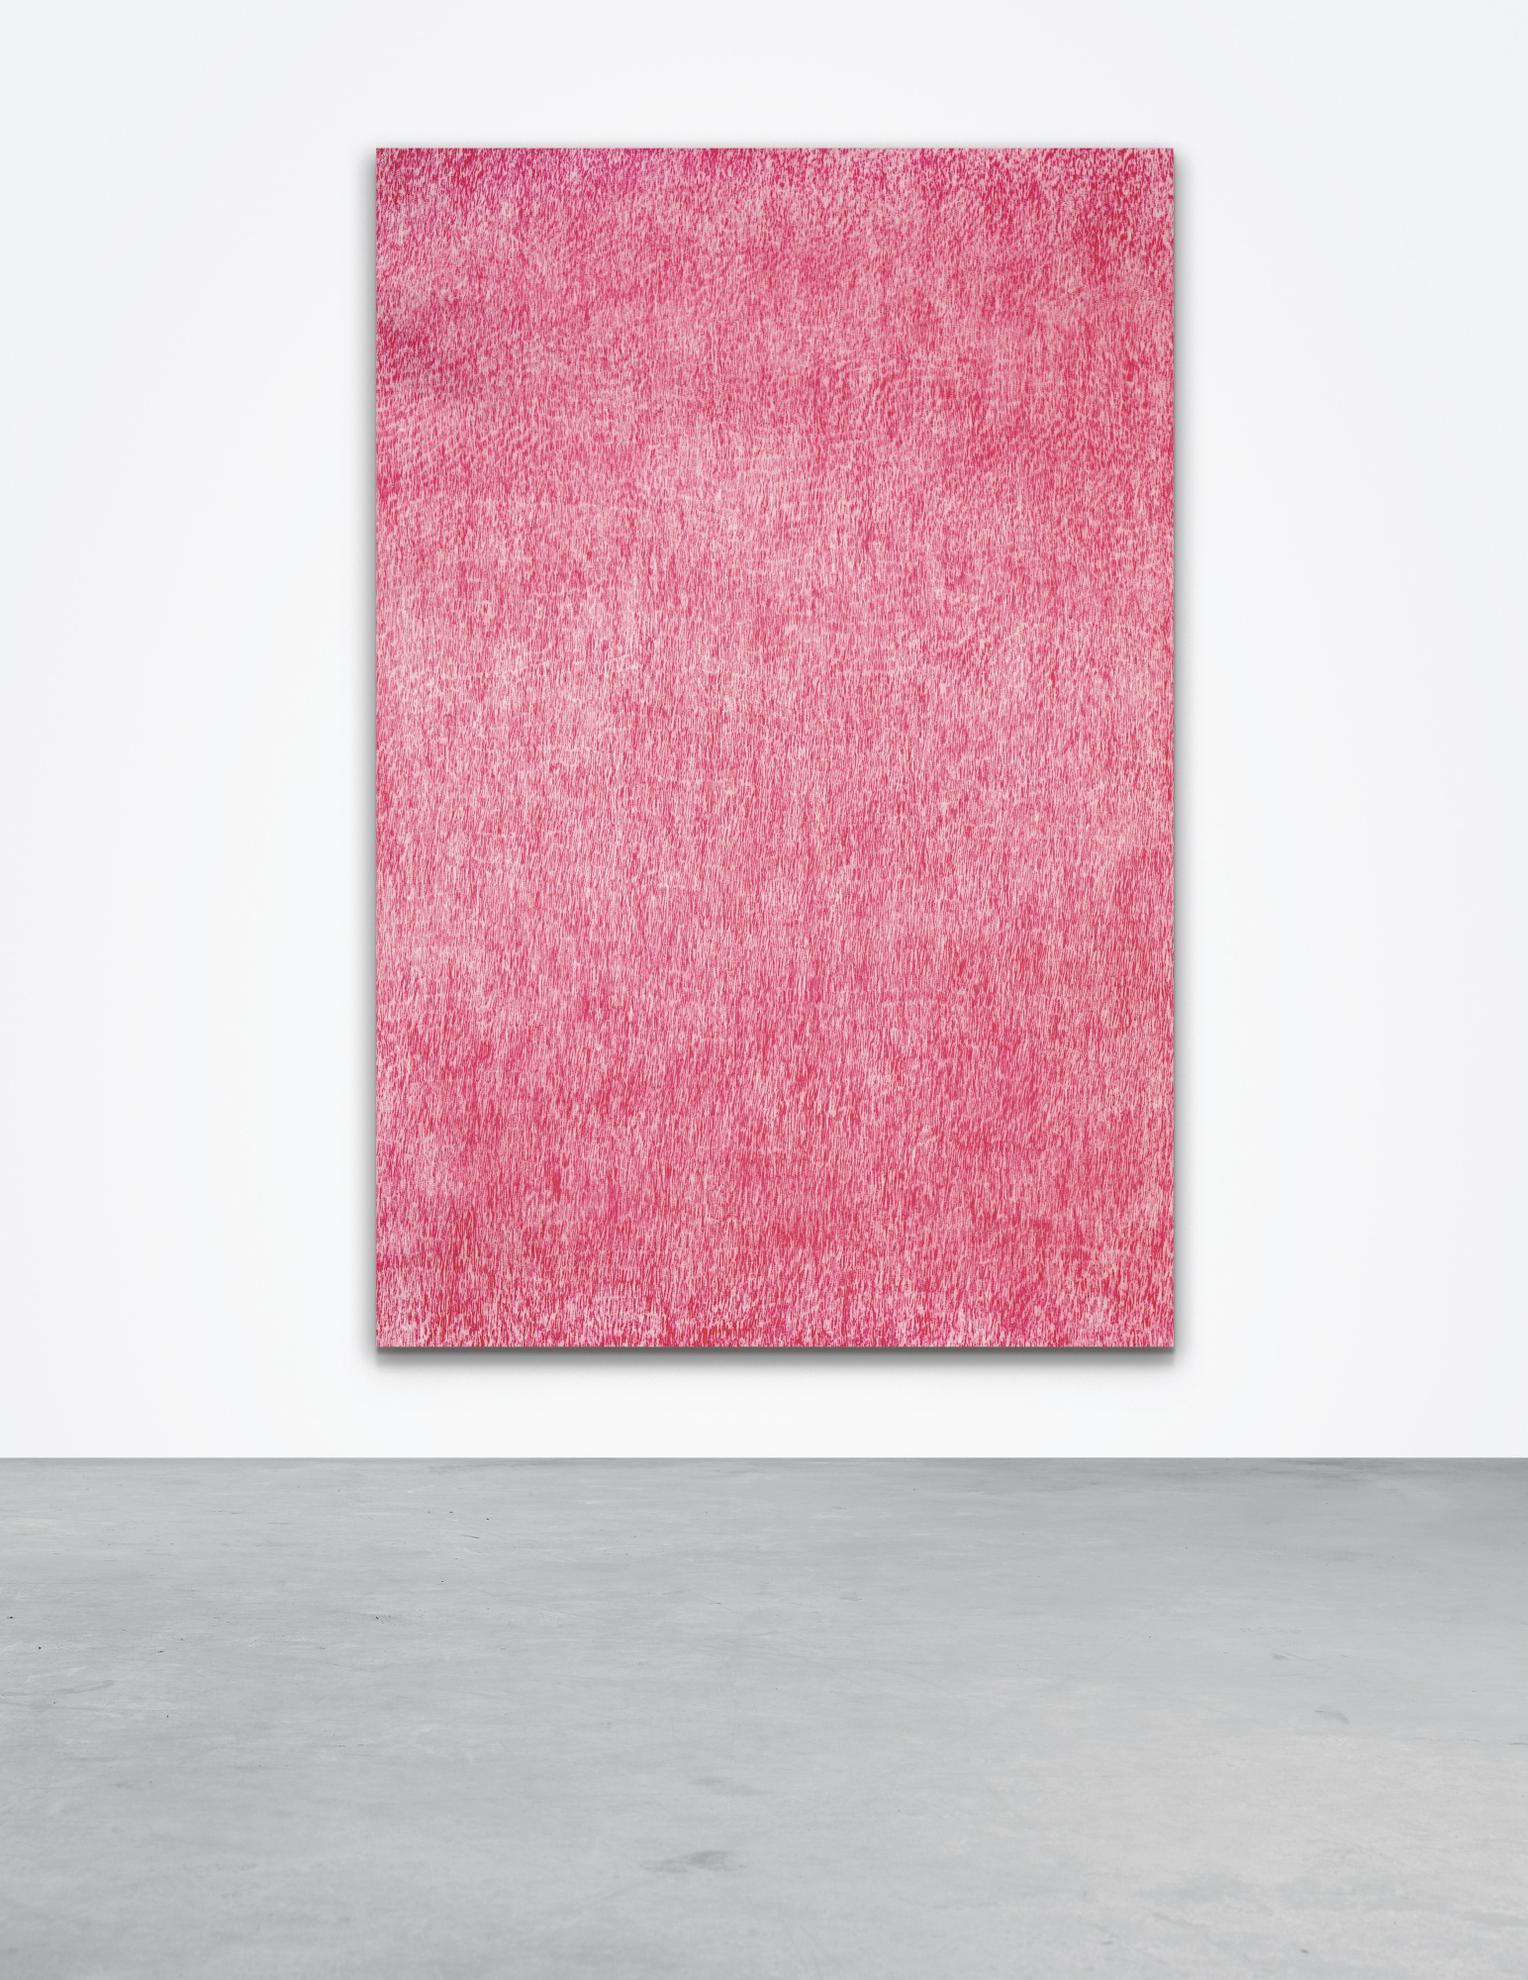 Mohammed Kazem - Untitled-2013